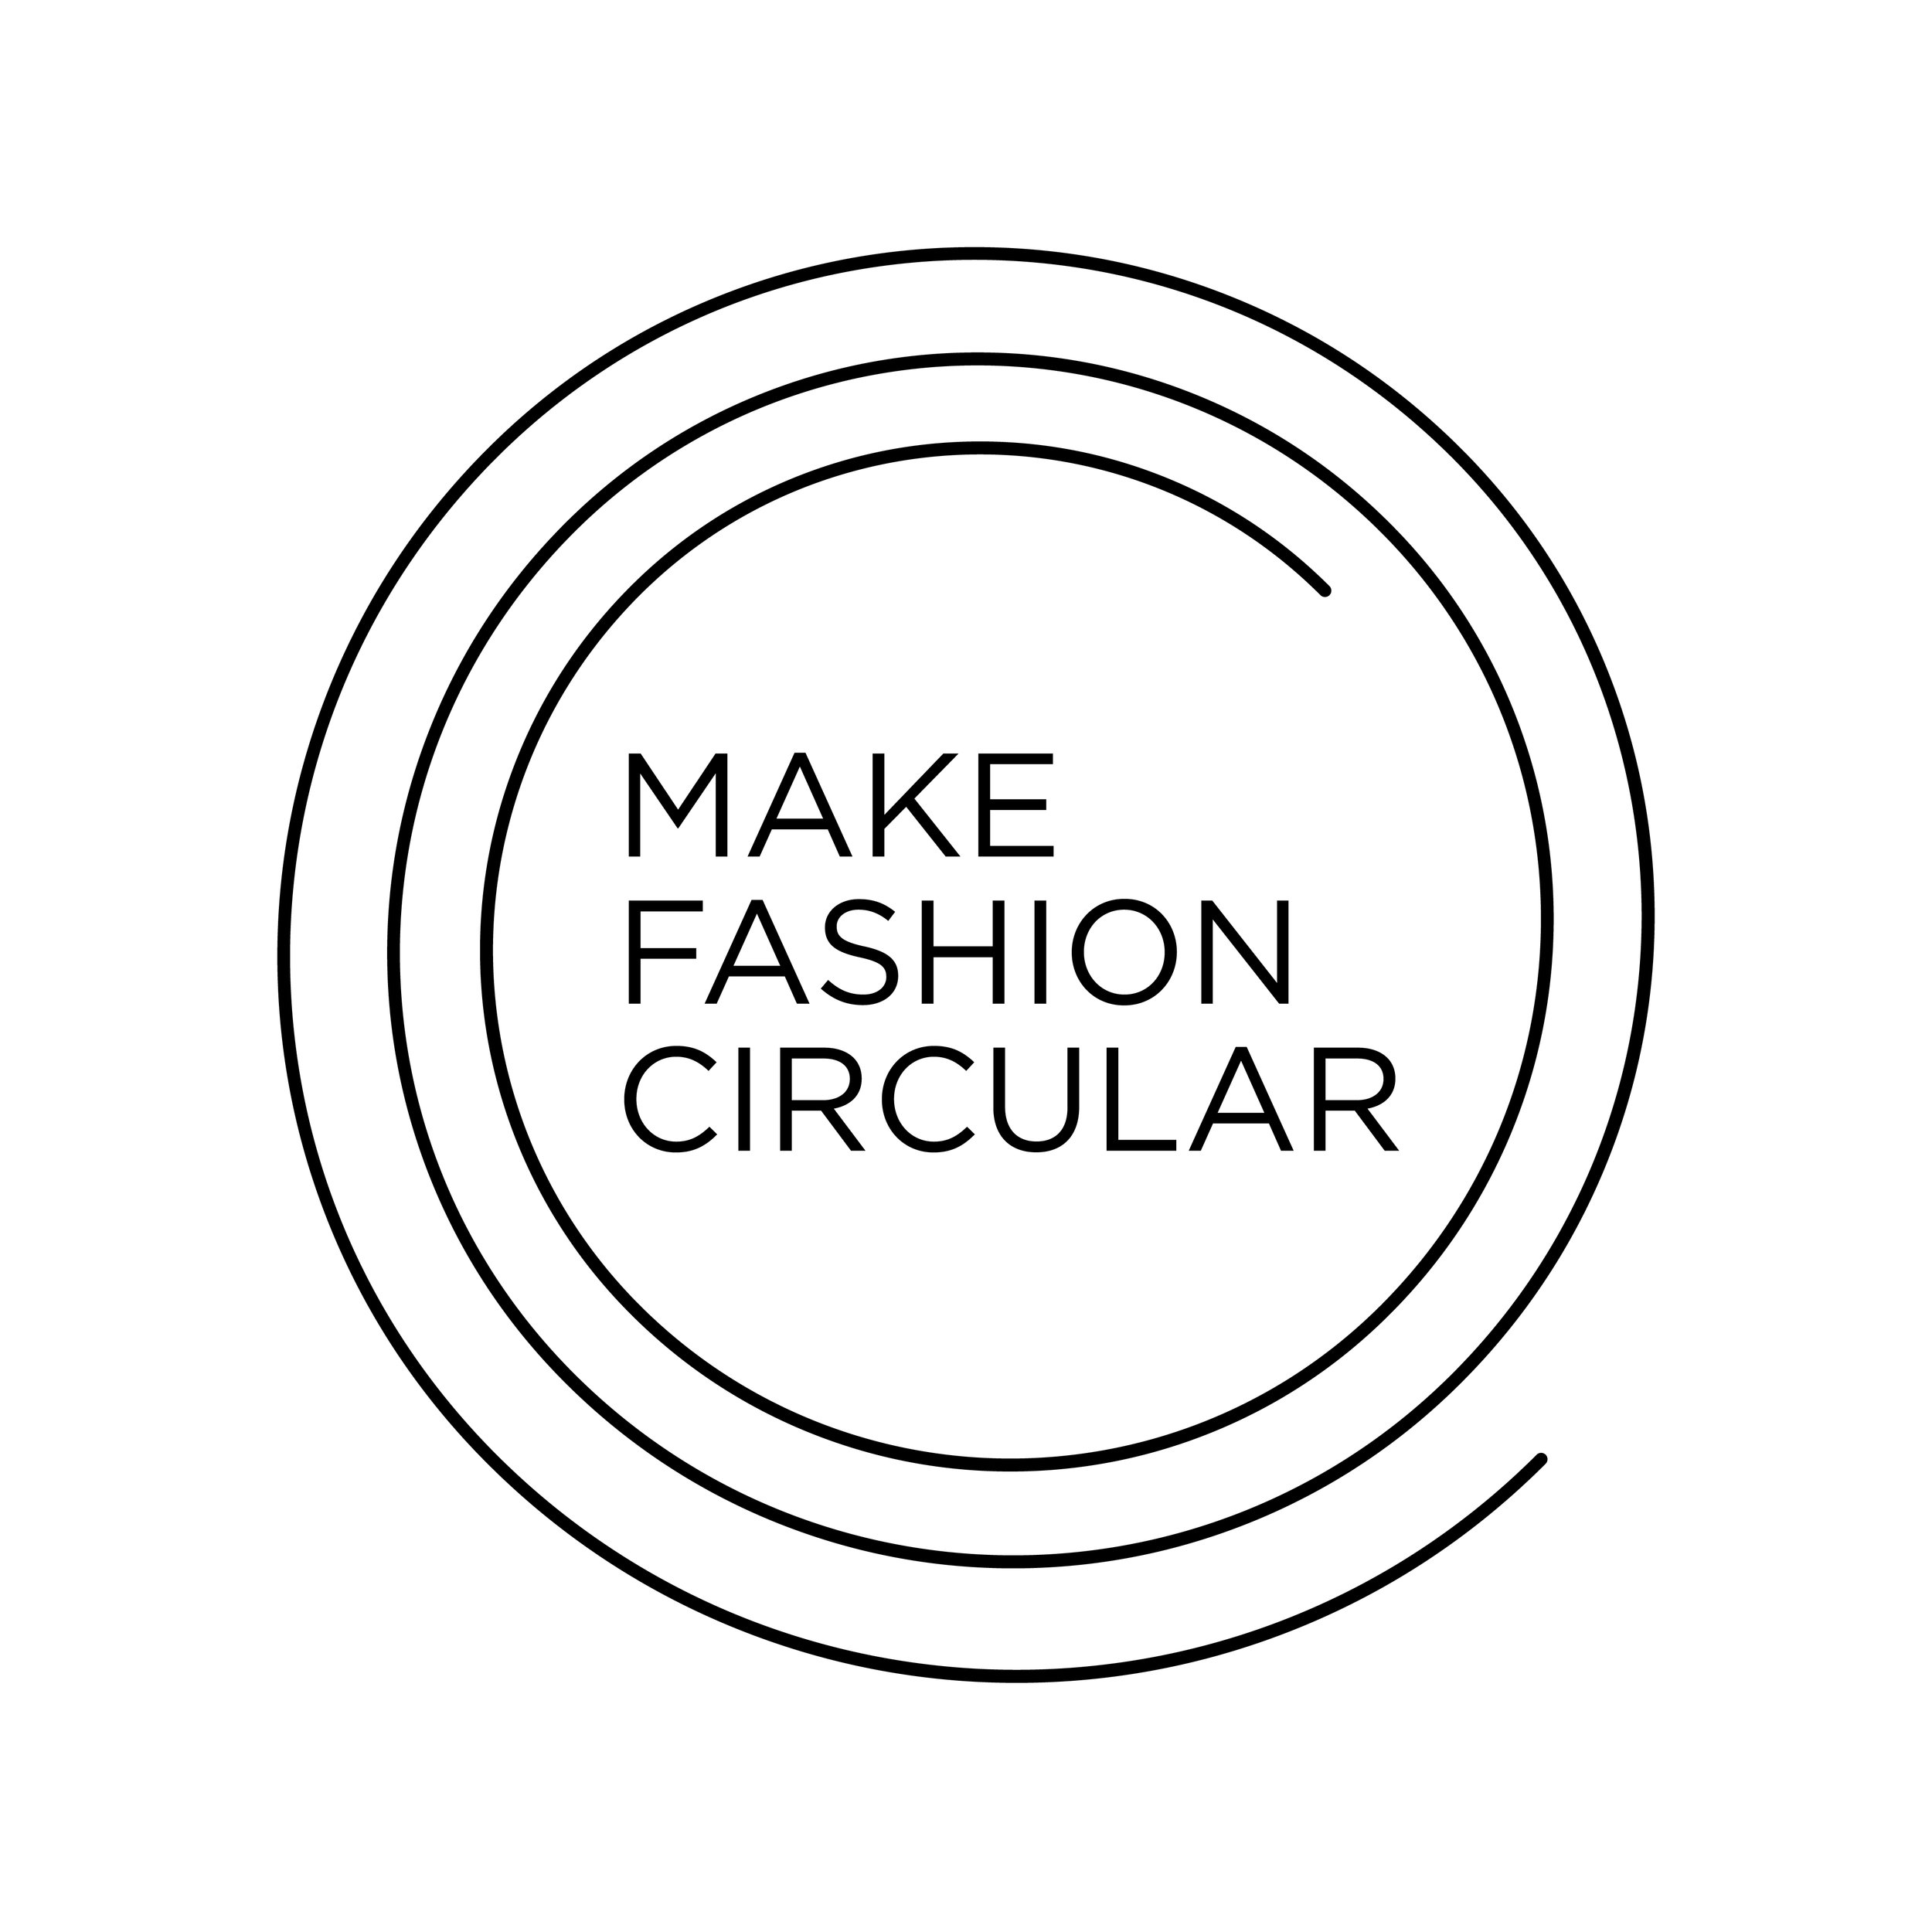 Make Fashion Circular_Black.jpg